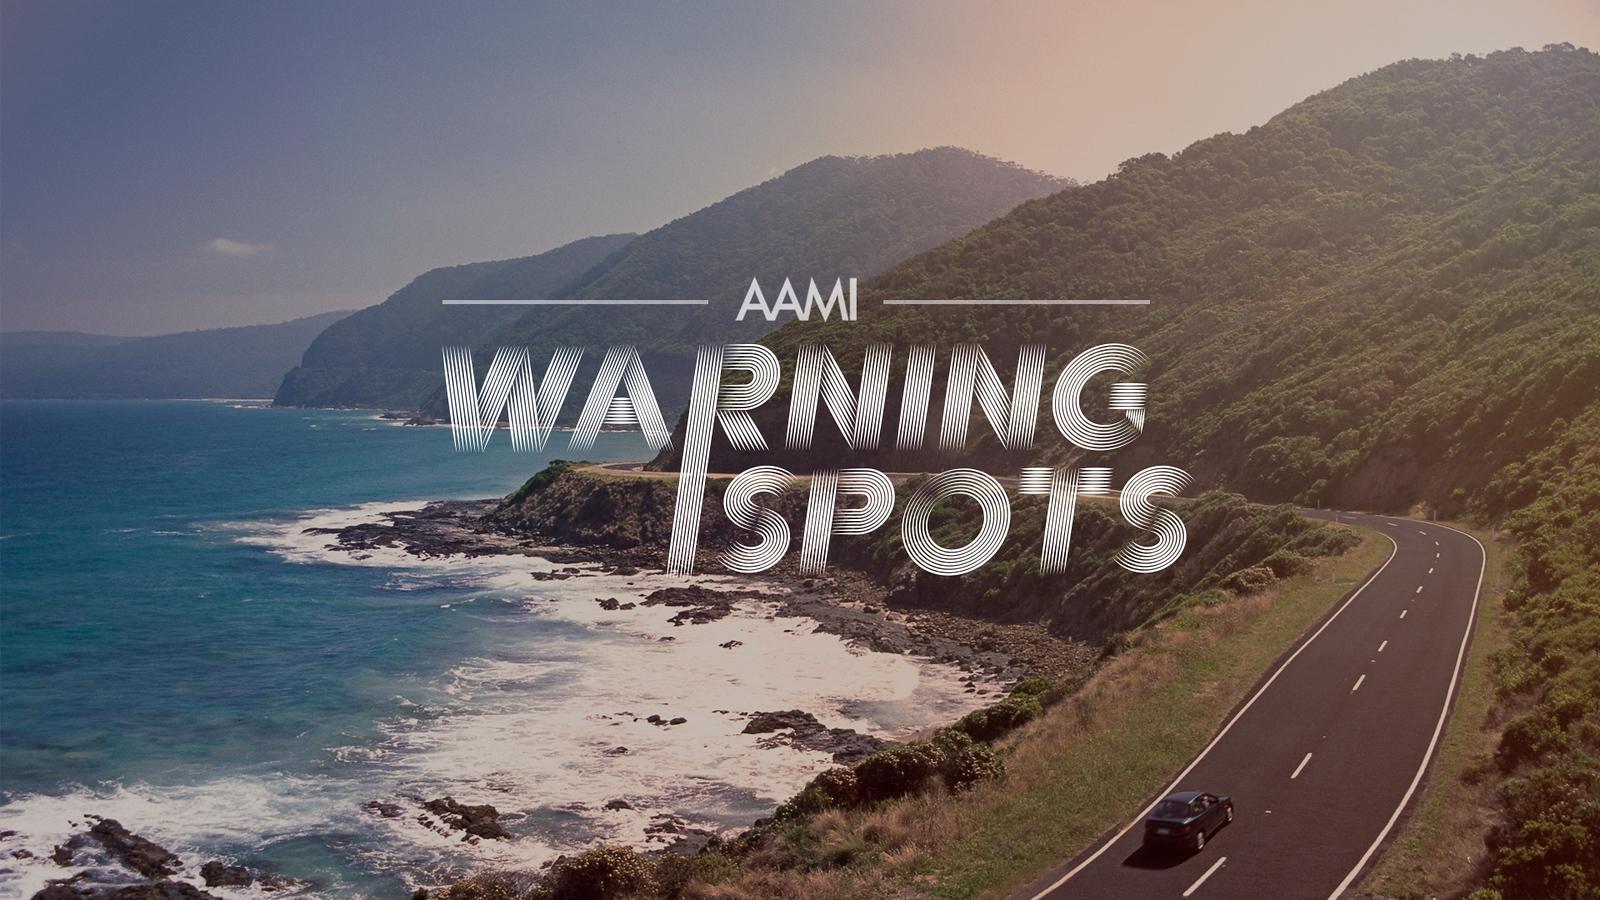 Warning Spots (photo credit: AAMI/Spotify/Ogilvy Melbourne)